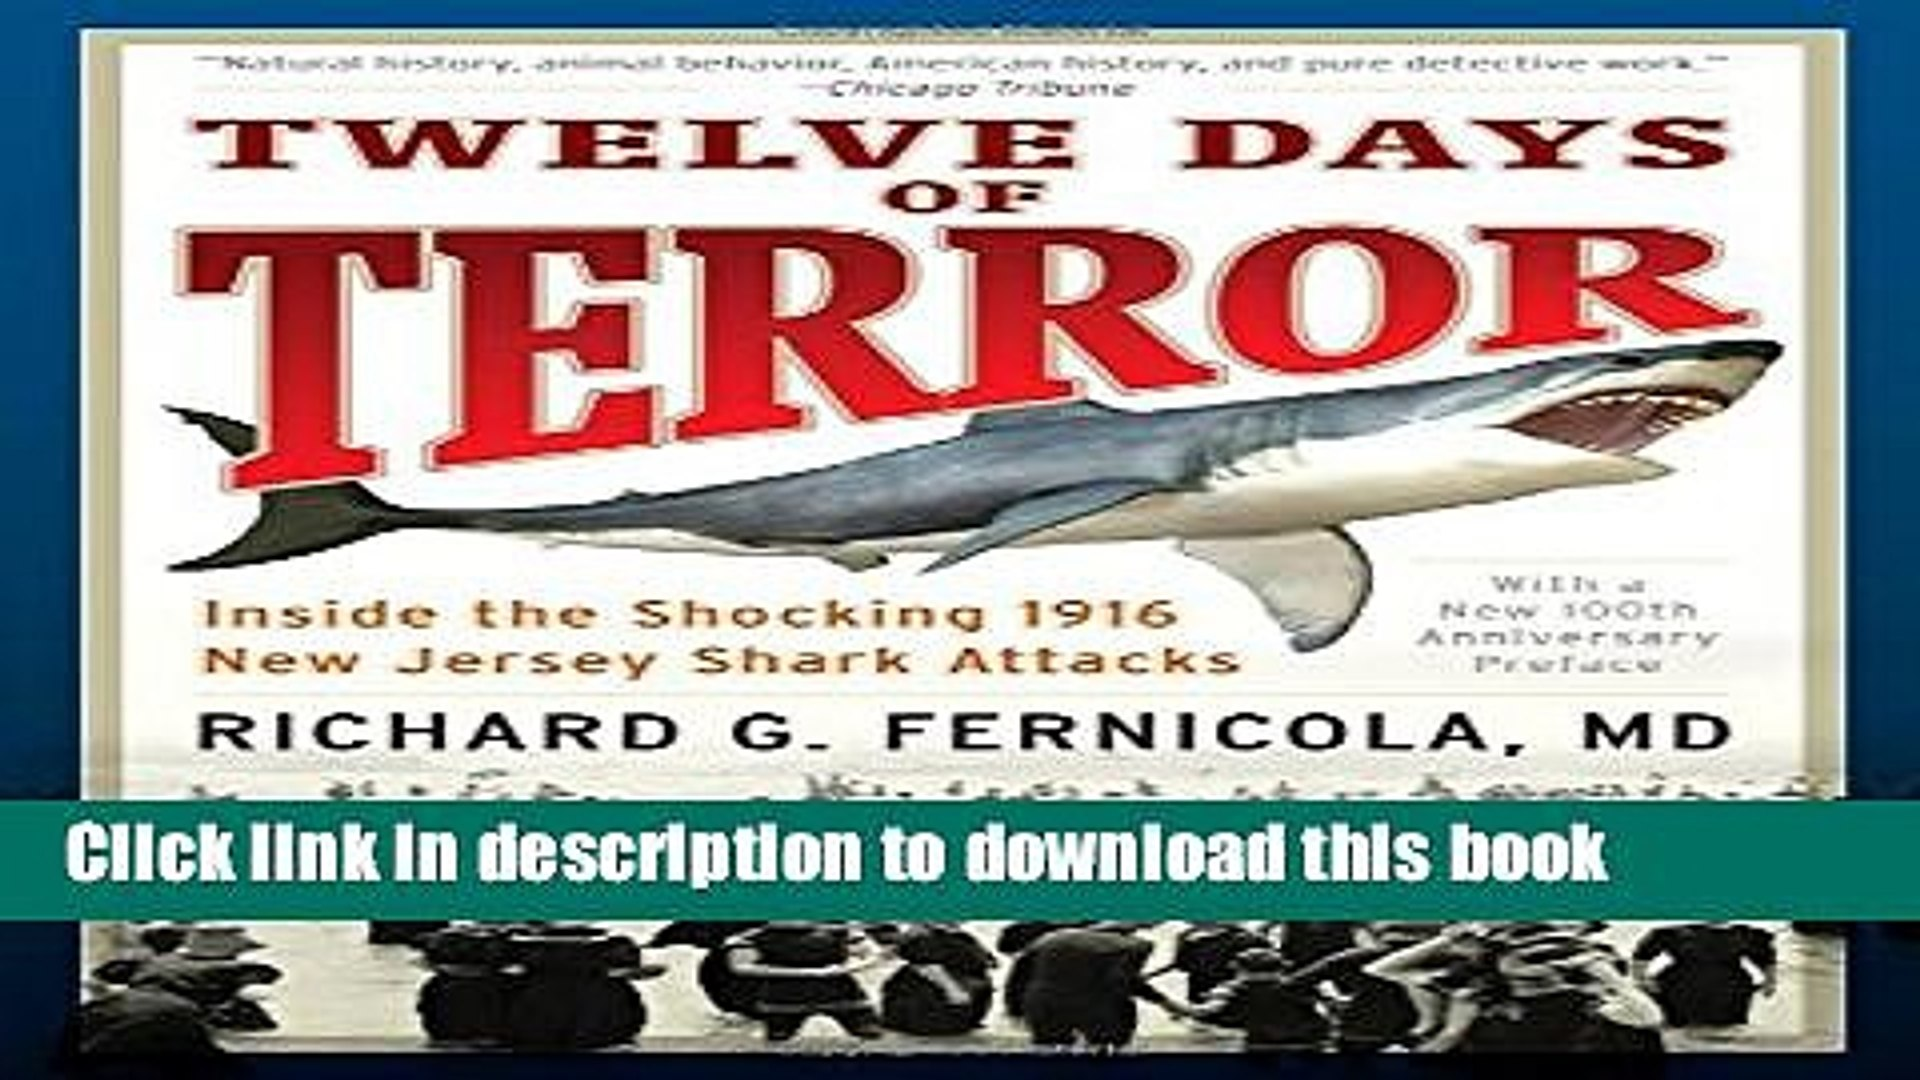 Read Twelve Days of Terror: Inside the Shocking 1916 New Jersey Shark Attacks PDF Free